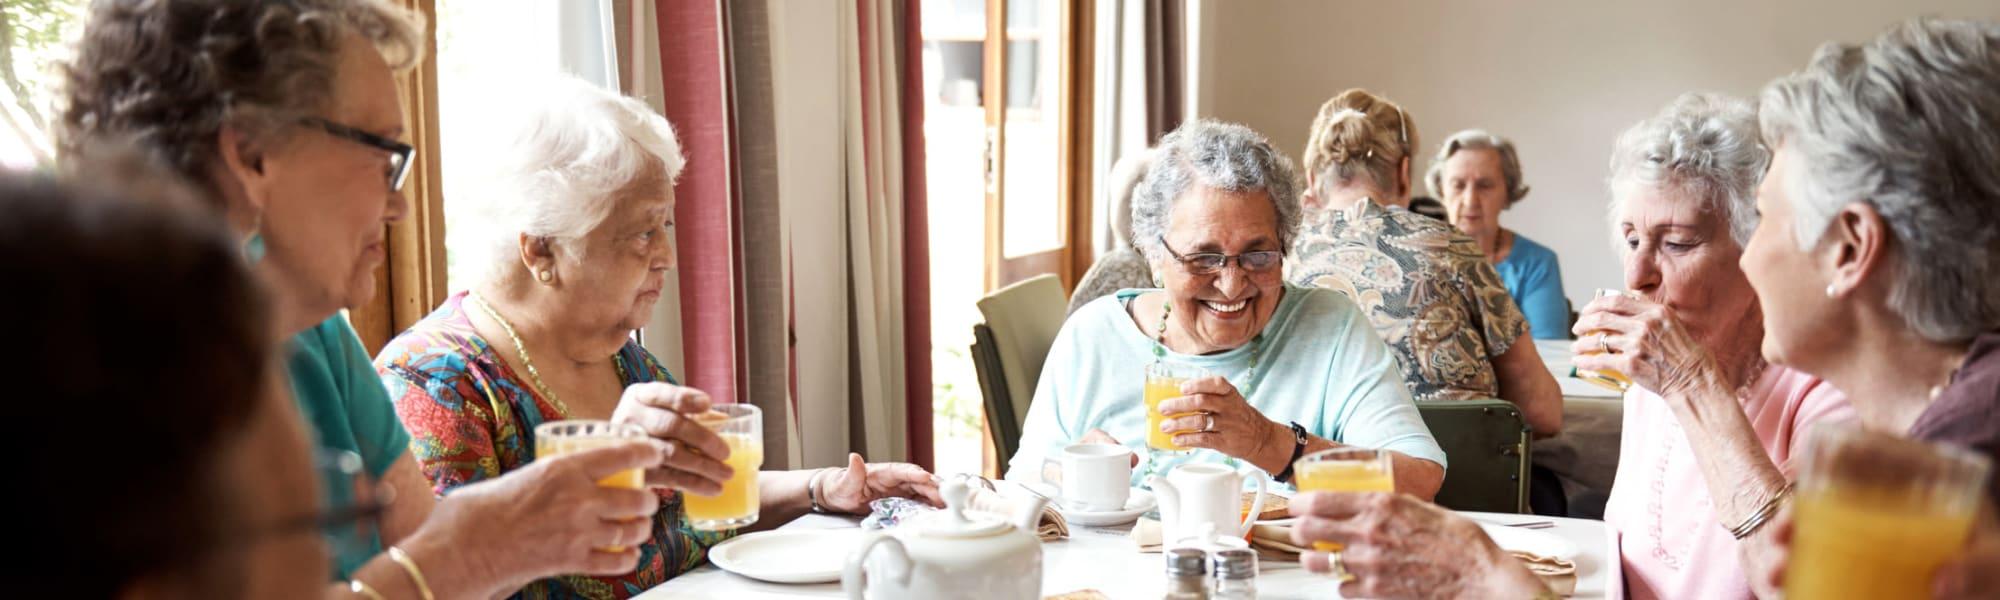 Privacy Policy at La Conner Retirement Inn in La Conner, Washington